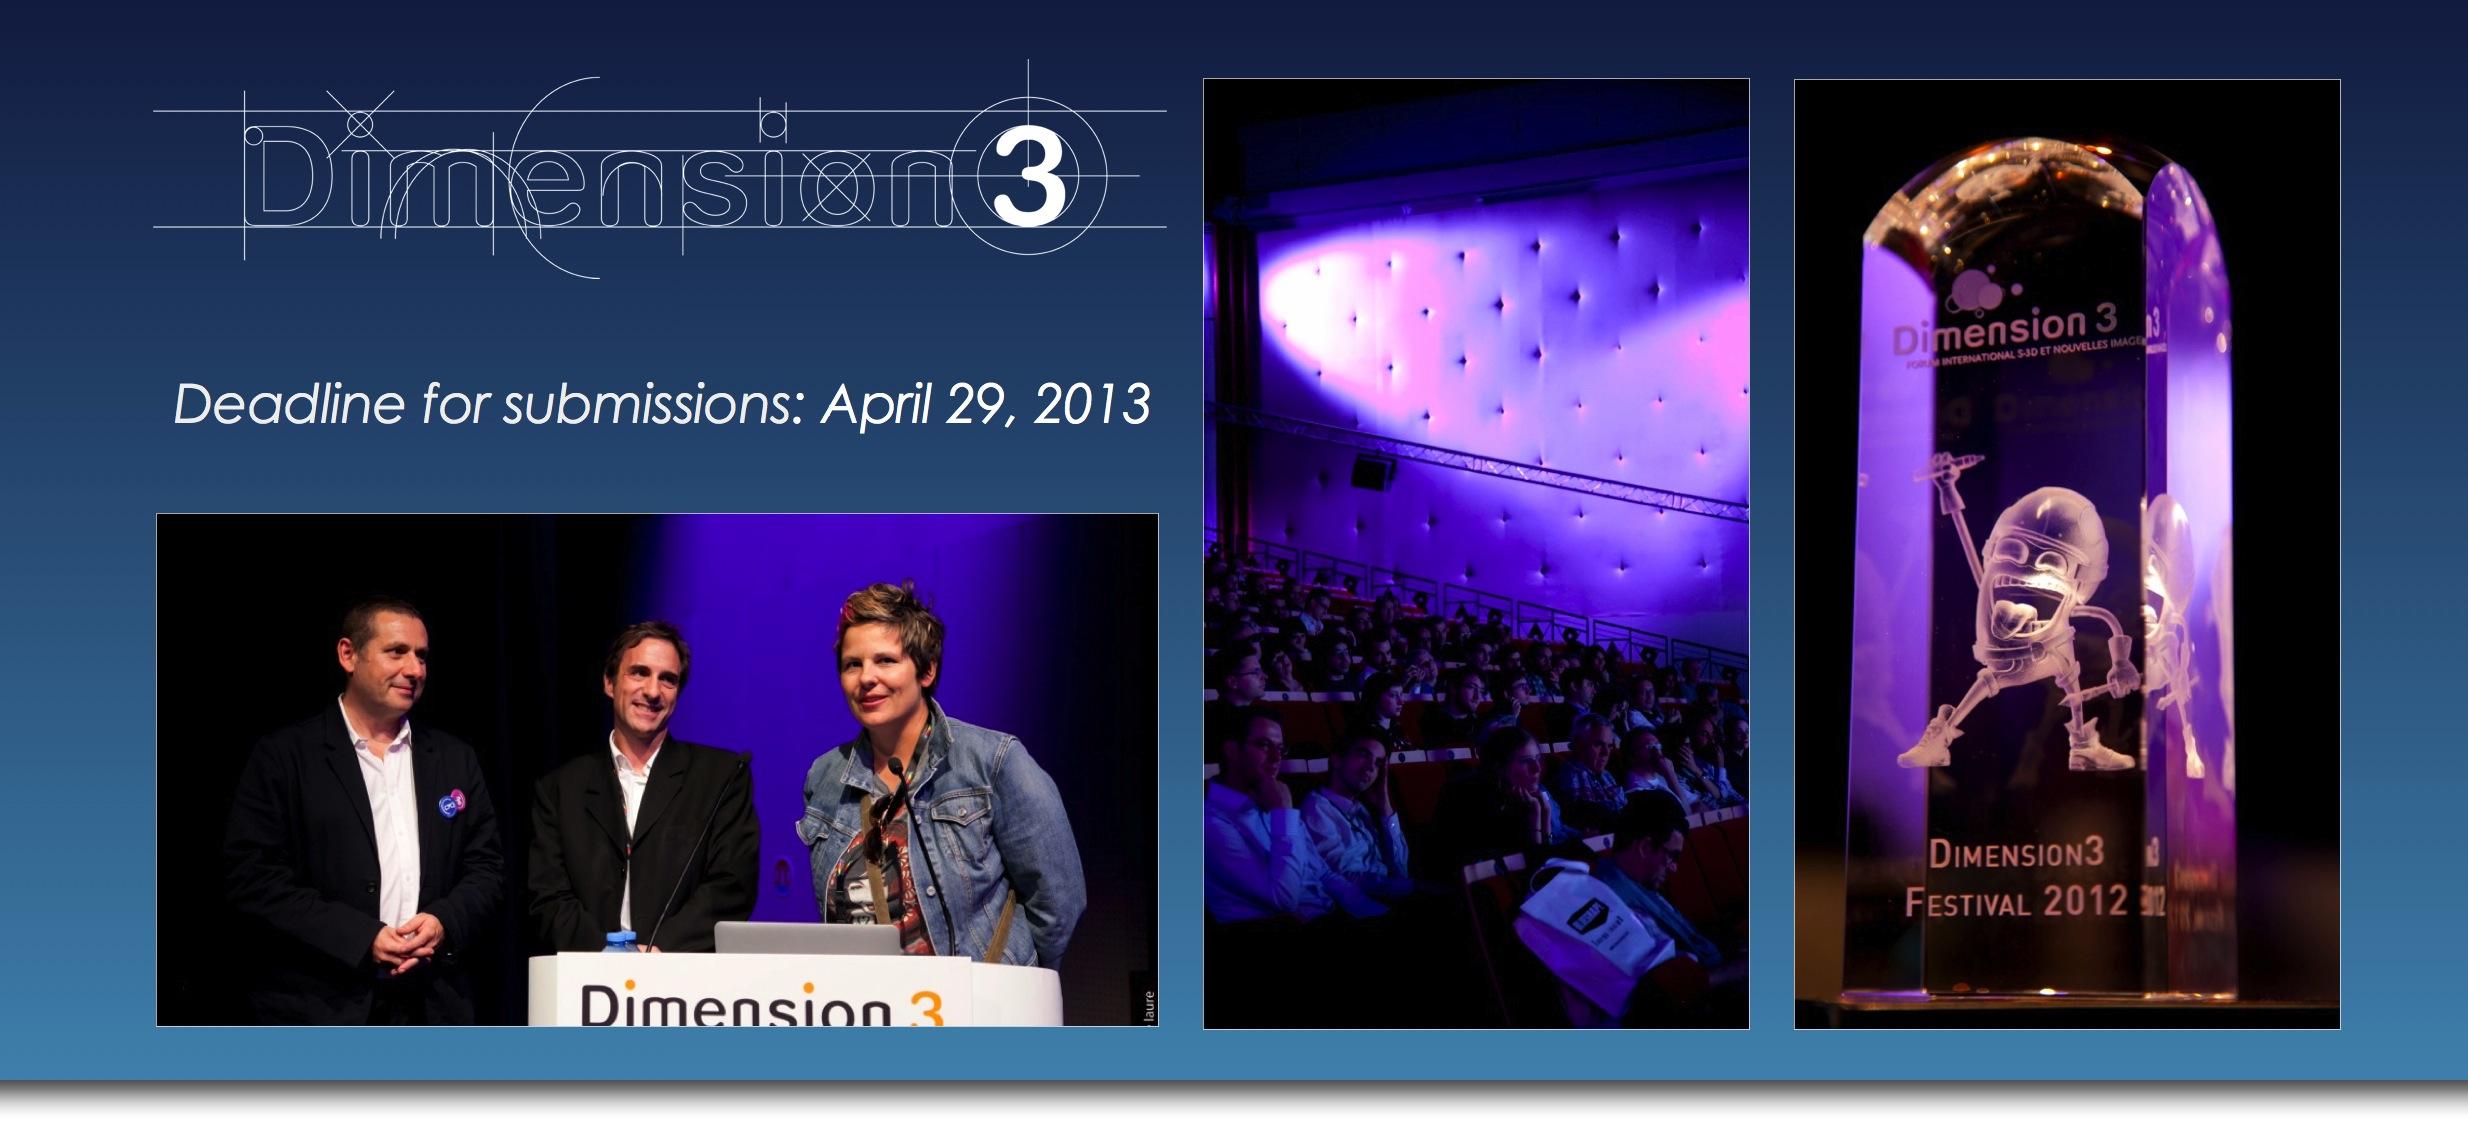 Film-Festival Dimension 3 nun auch mit Kategorie für Ultra HD Content